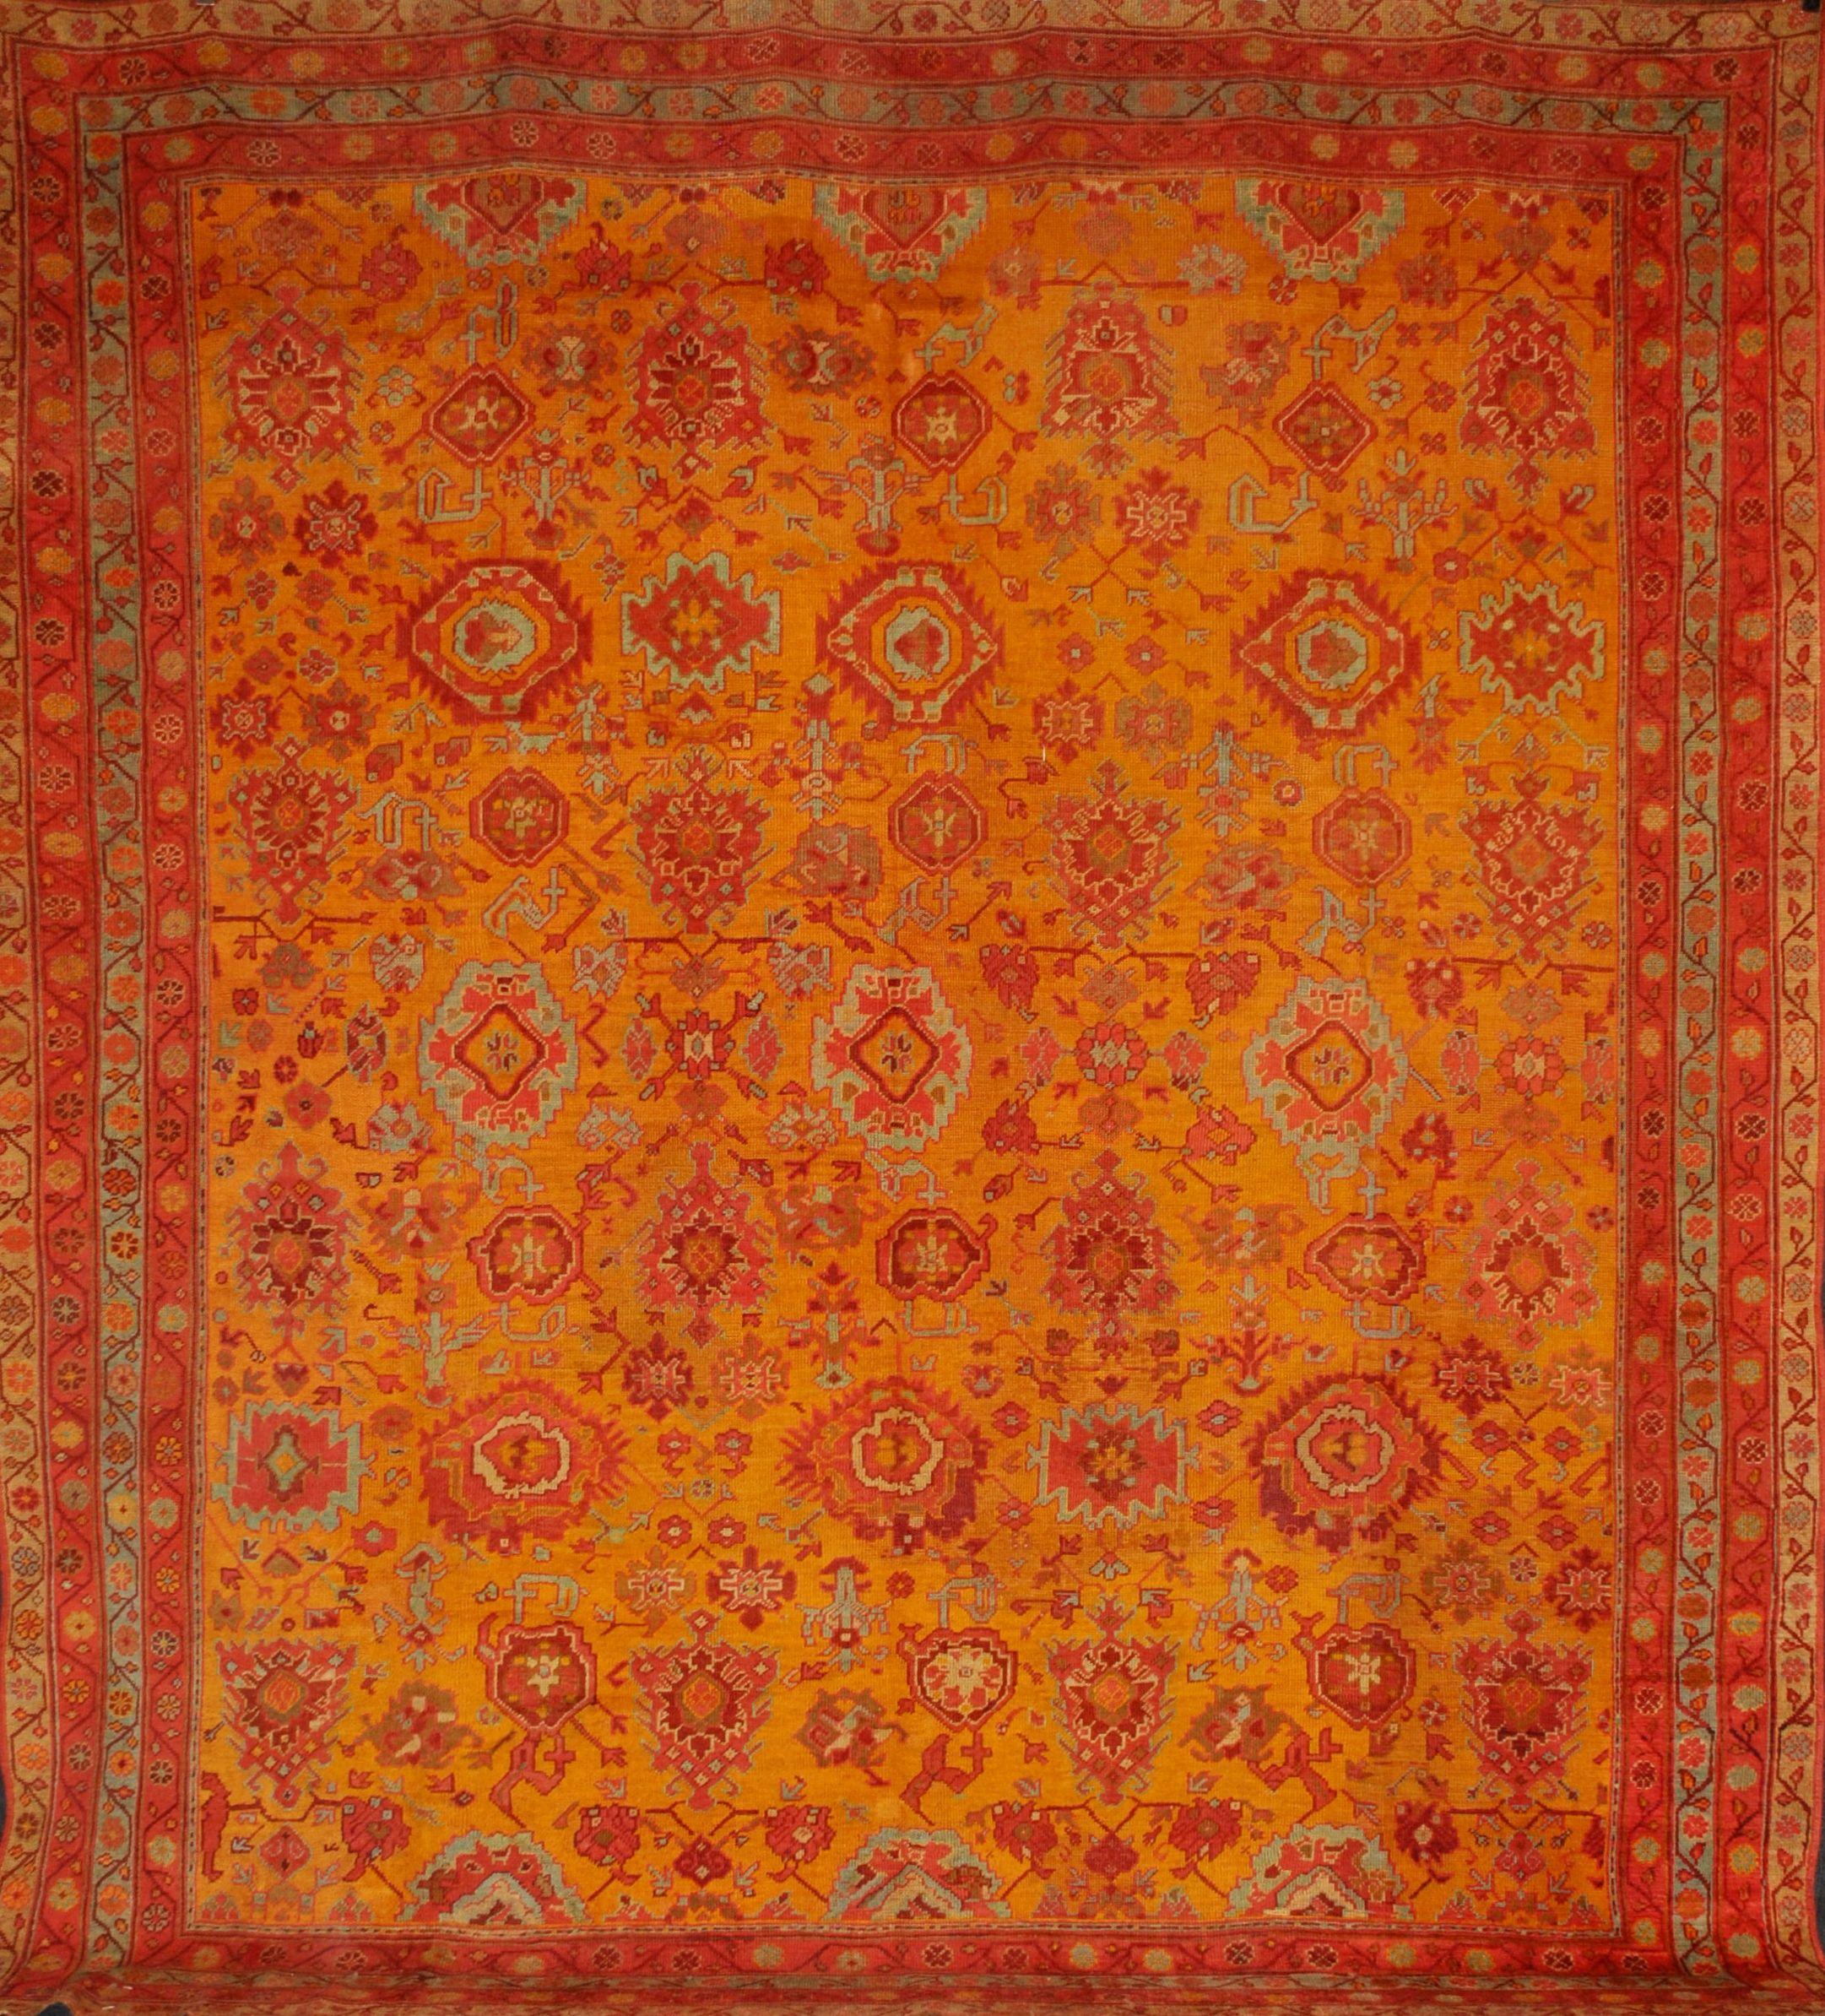 Fr4938 Antique Turkish Oushak Rugs Home D Cor Color Antique Rugs Oushaks